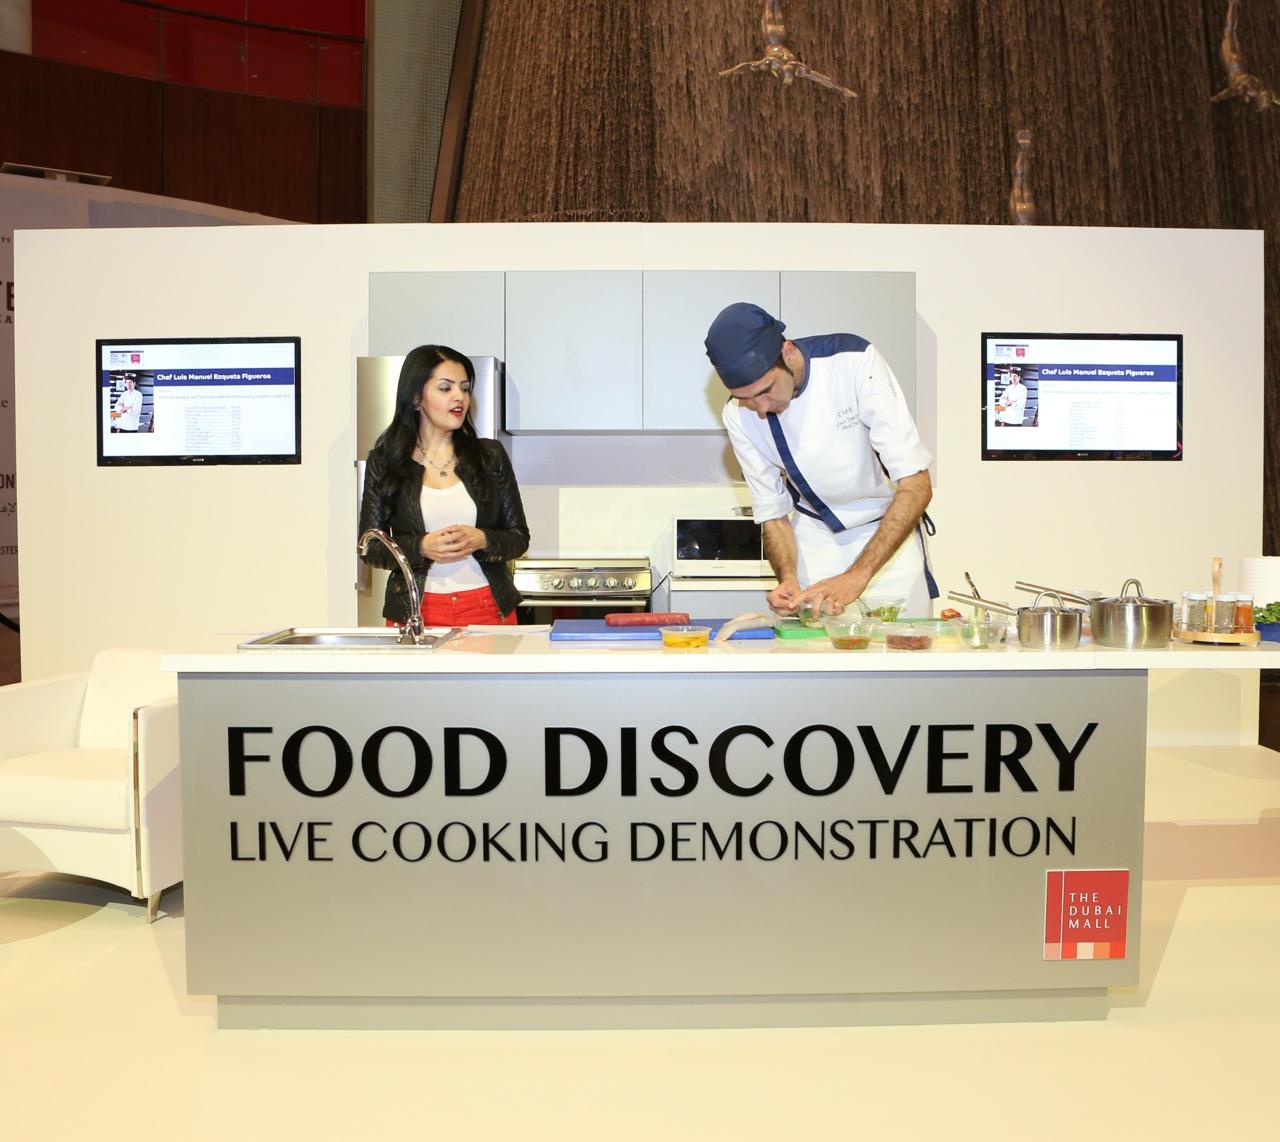 Listing: The Dubai Mall and Souk Al Bahar mark Dubai Food